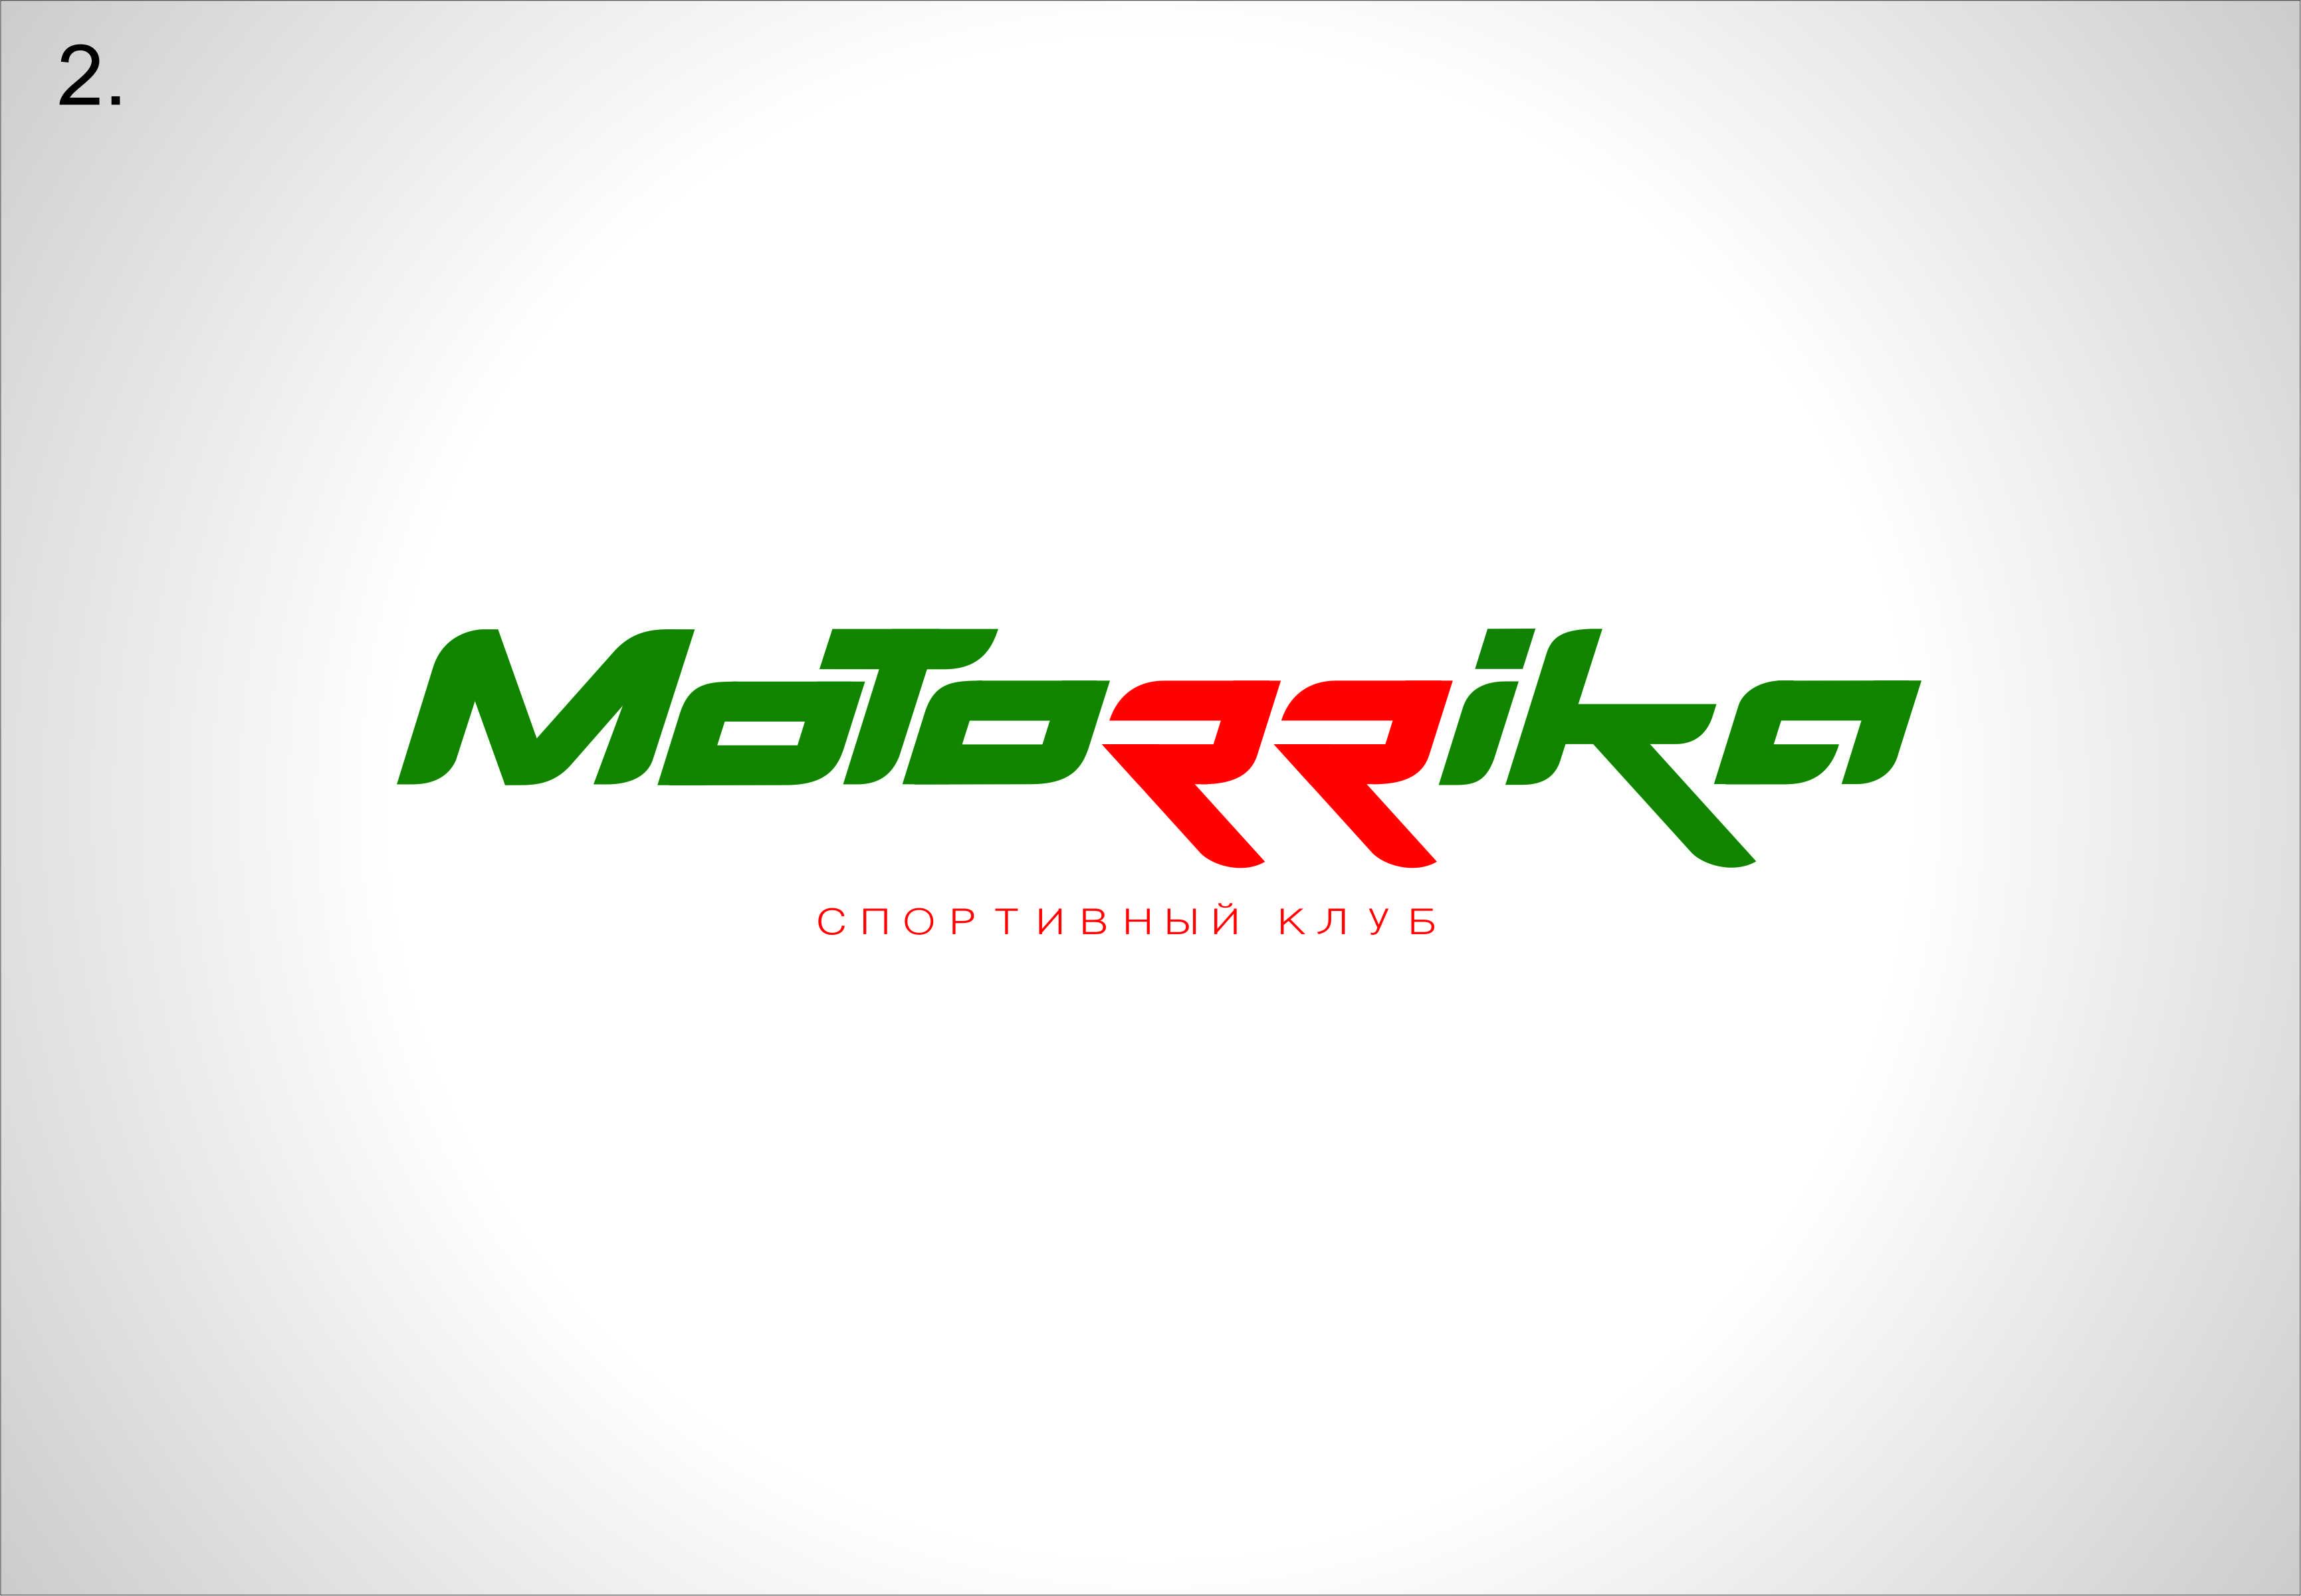 Мотогонки. Логотип, фирменный стиль. фото f_4dc01b7a1f198.jpg